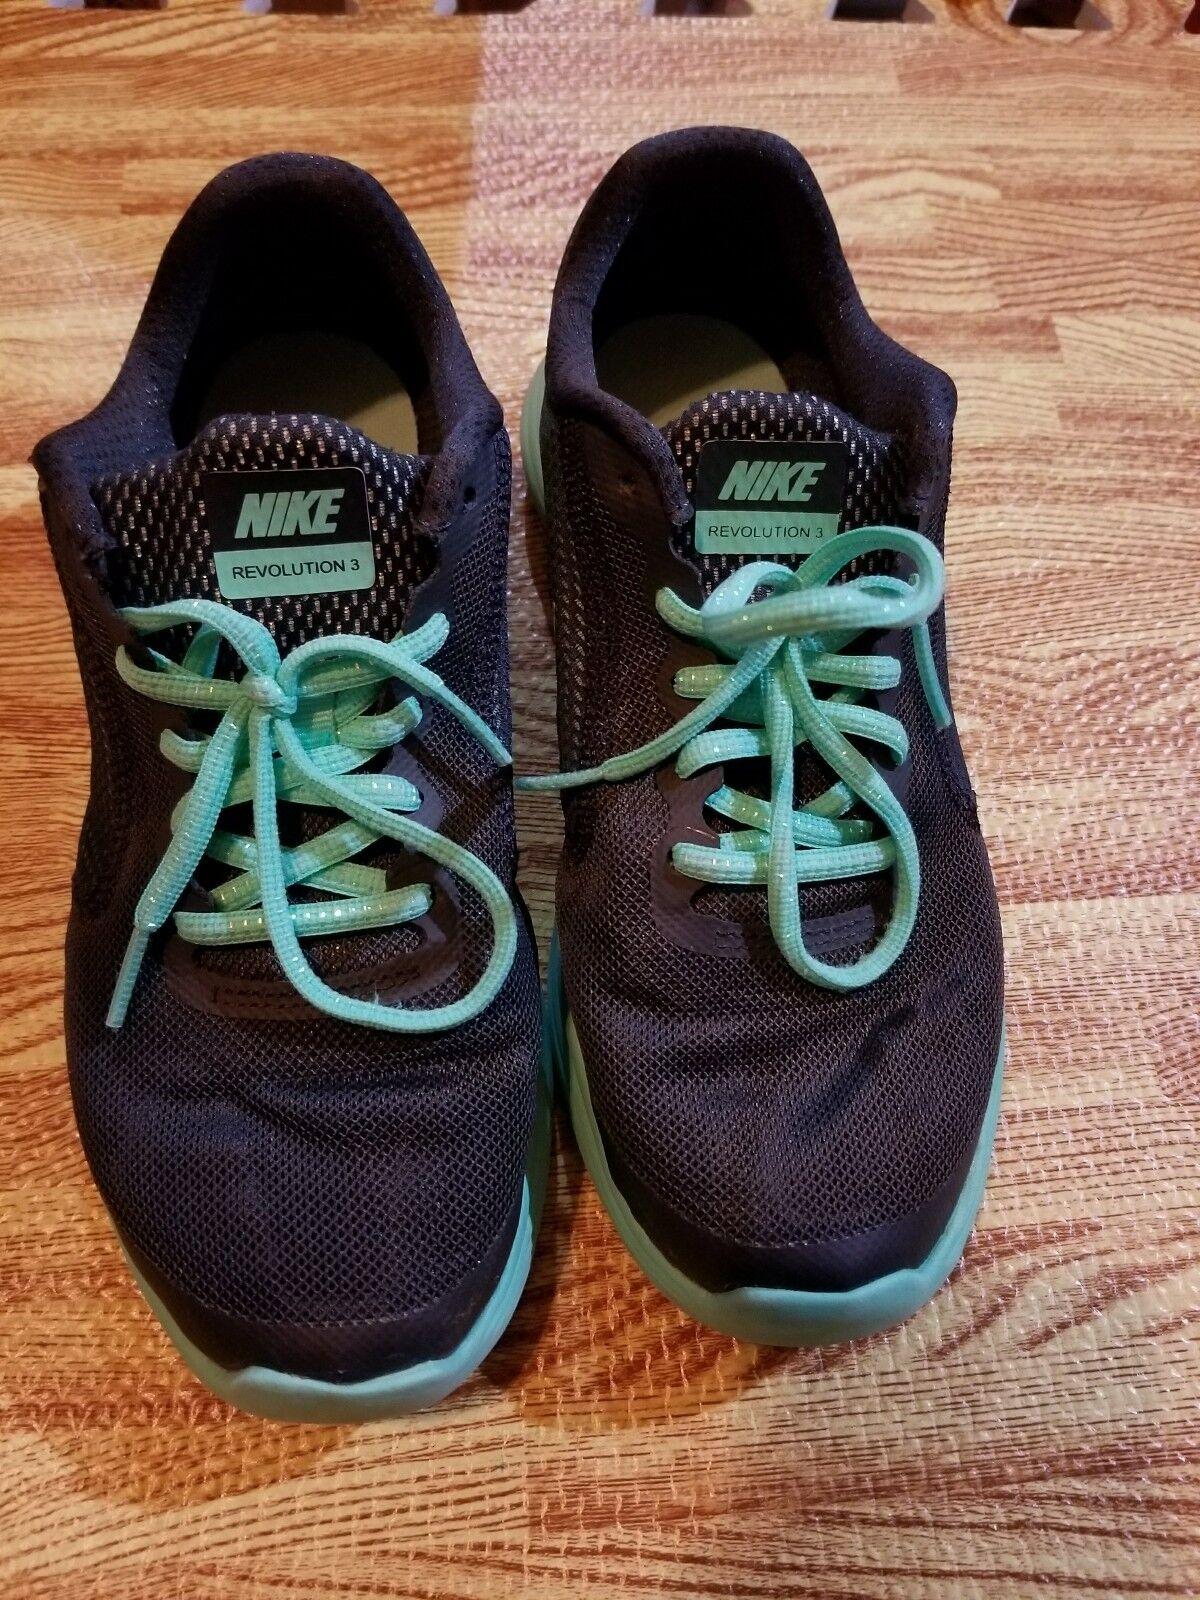 82728a4c0fc6 Nike Revolution Revolution Revolution 3 Running Shoe 819303-001 Dark Blue   Green Youth Size